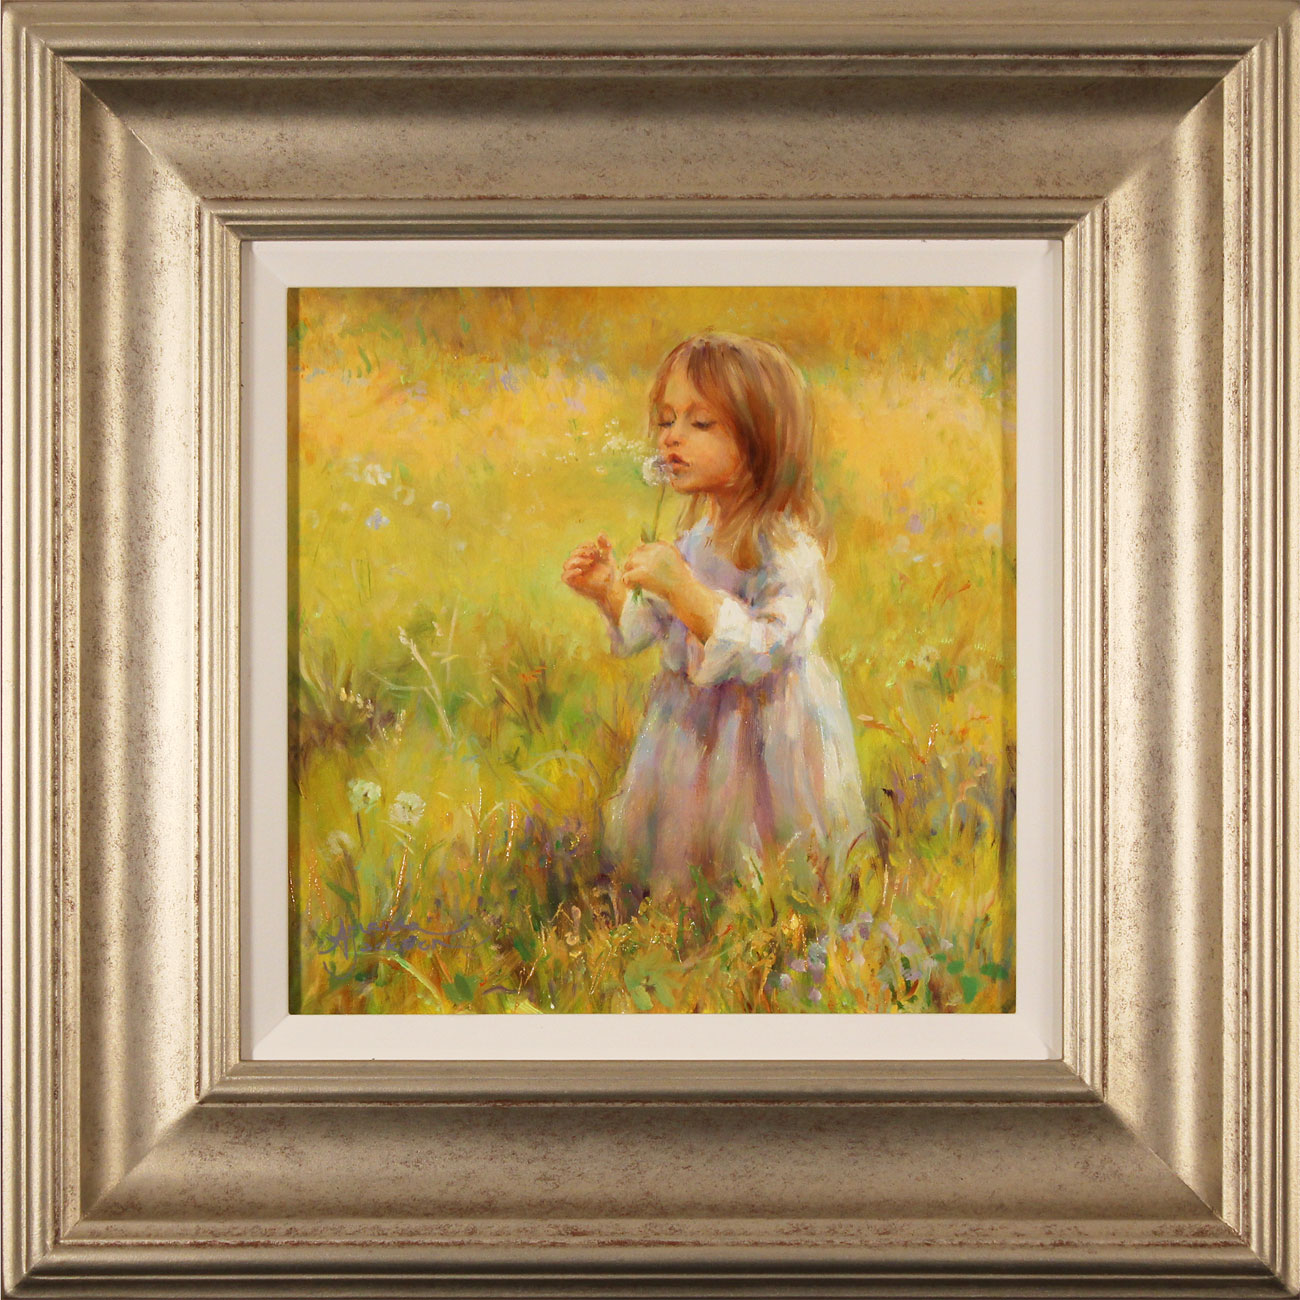 Amanda Jackson, Original oil painting on panel, Golden Memories Click to enlarge